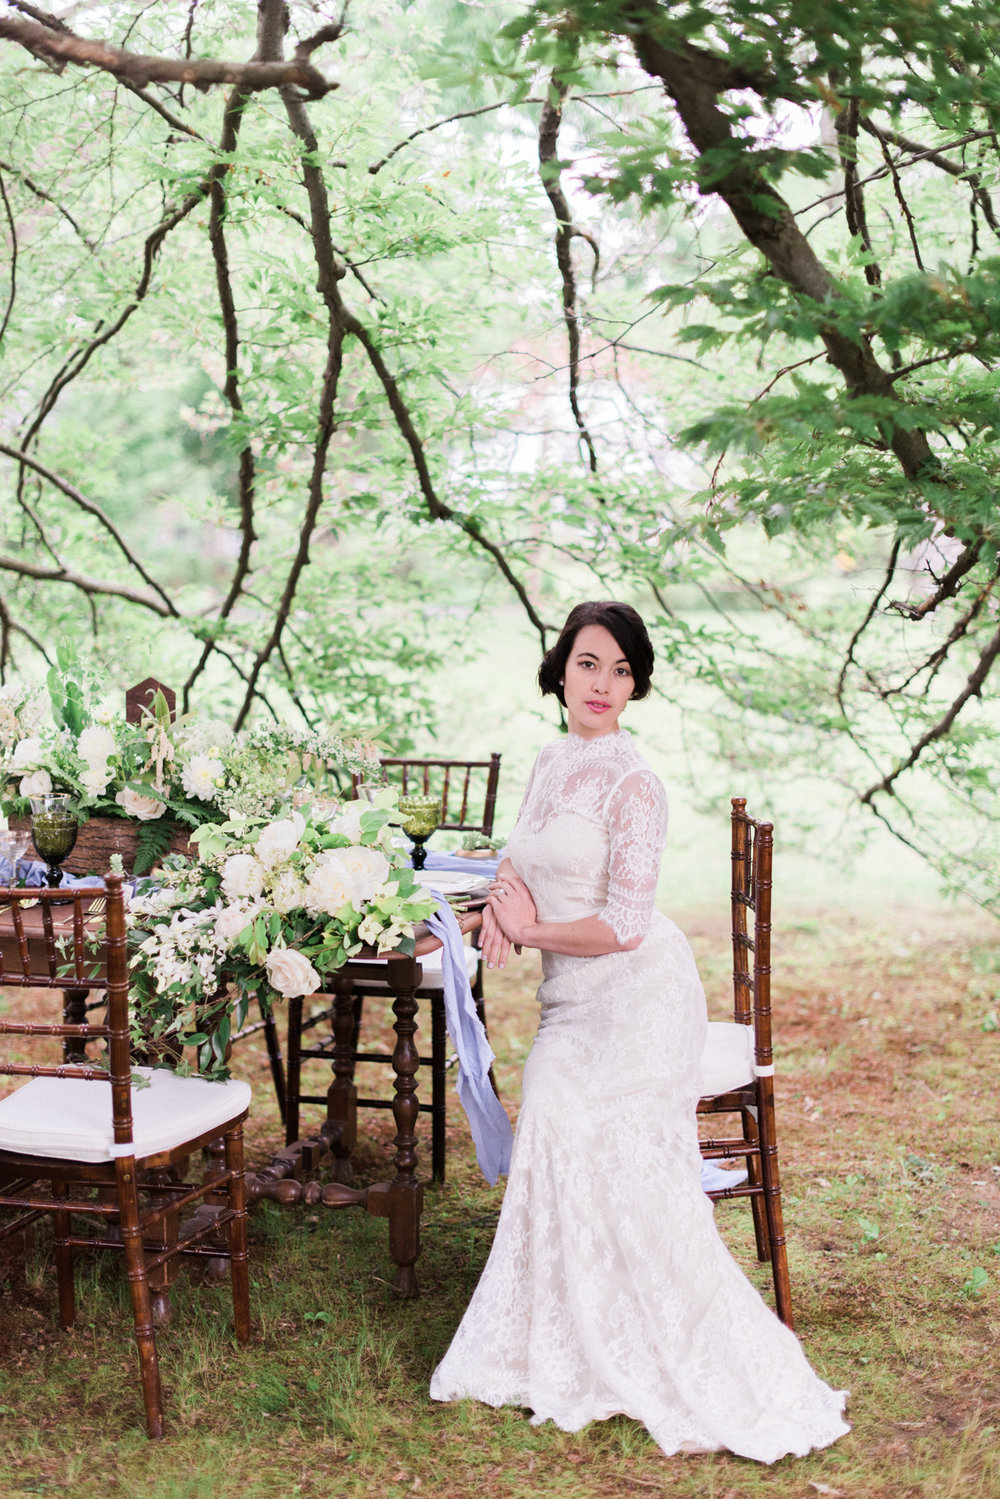 Wedding Photographers in Lenox MA